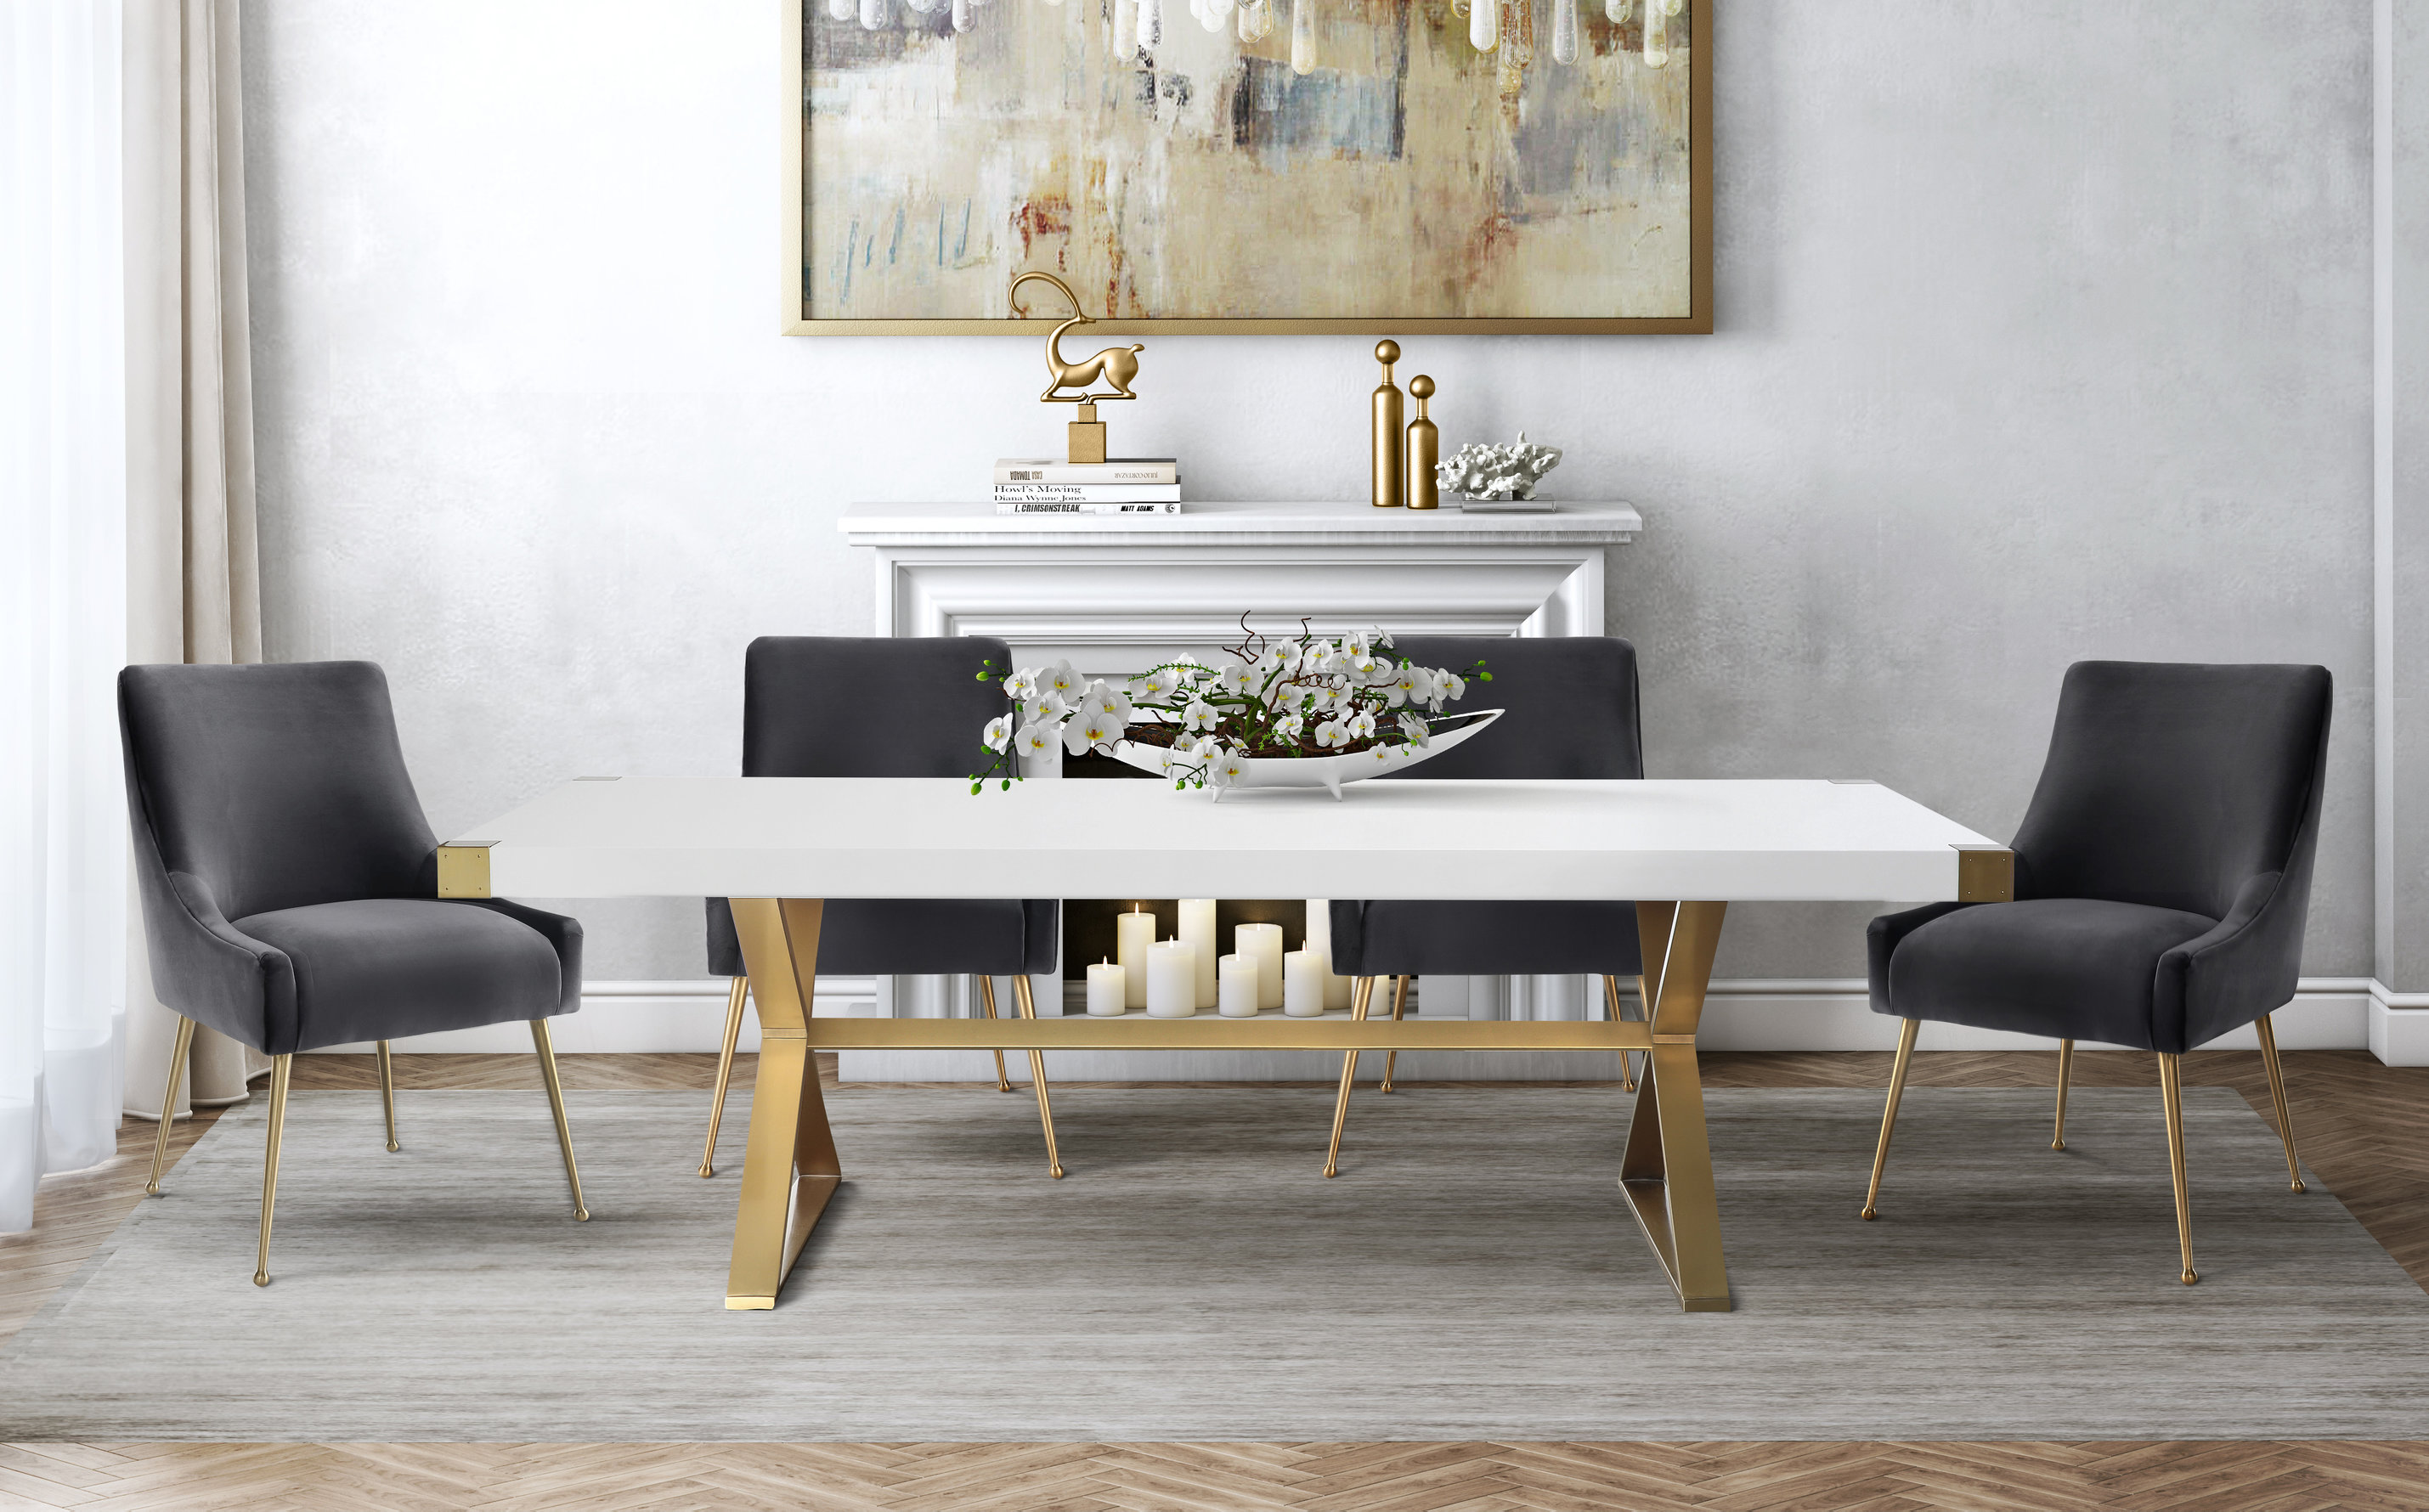 Adeline Dining Table Tov Furniture